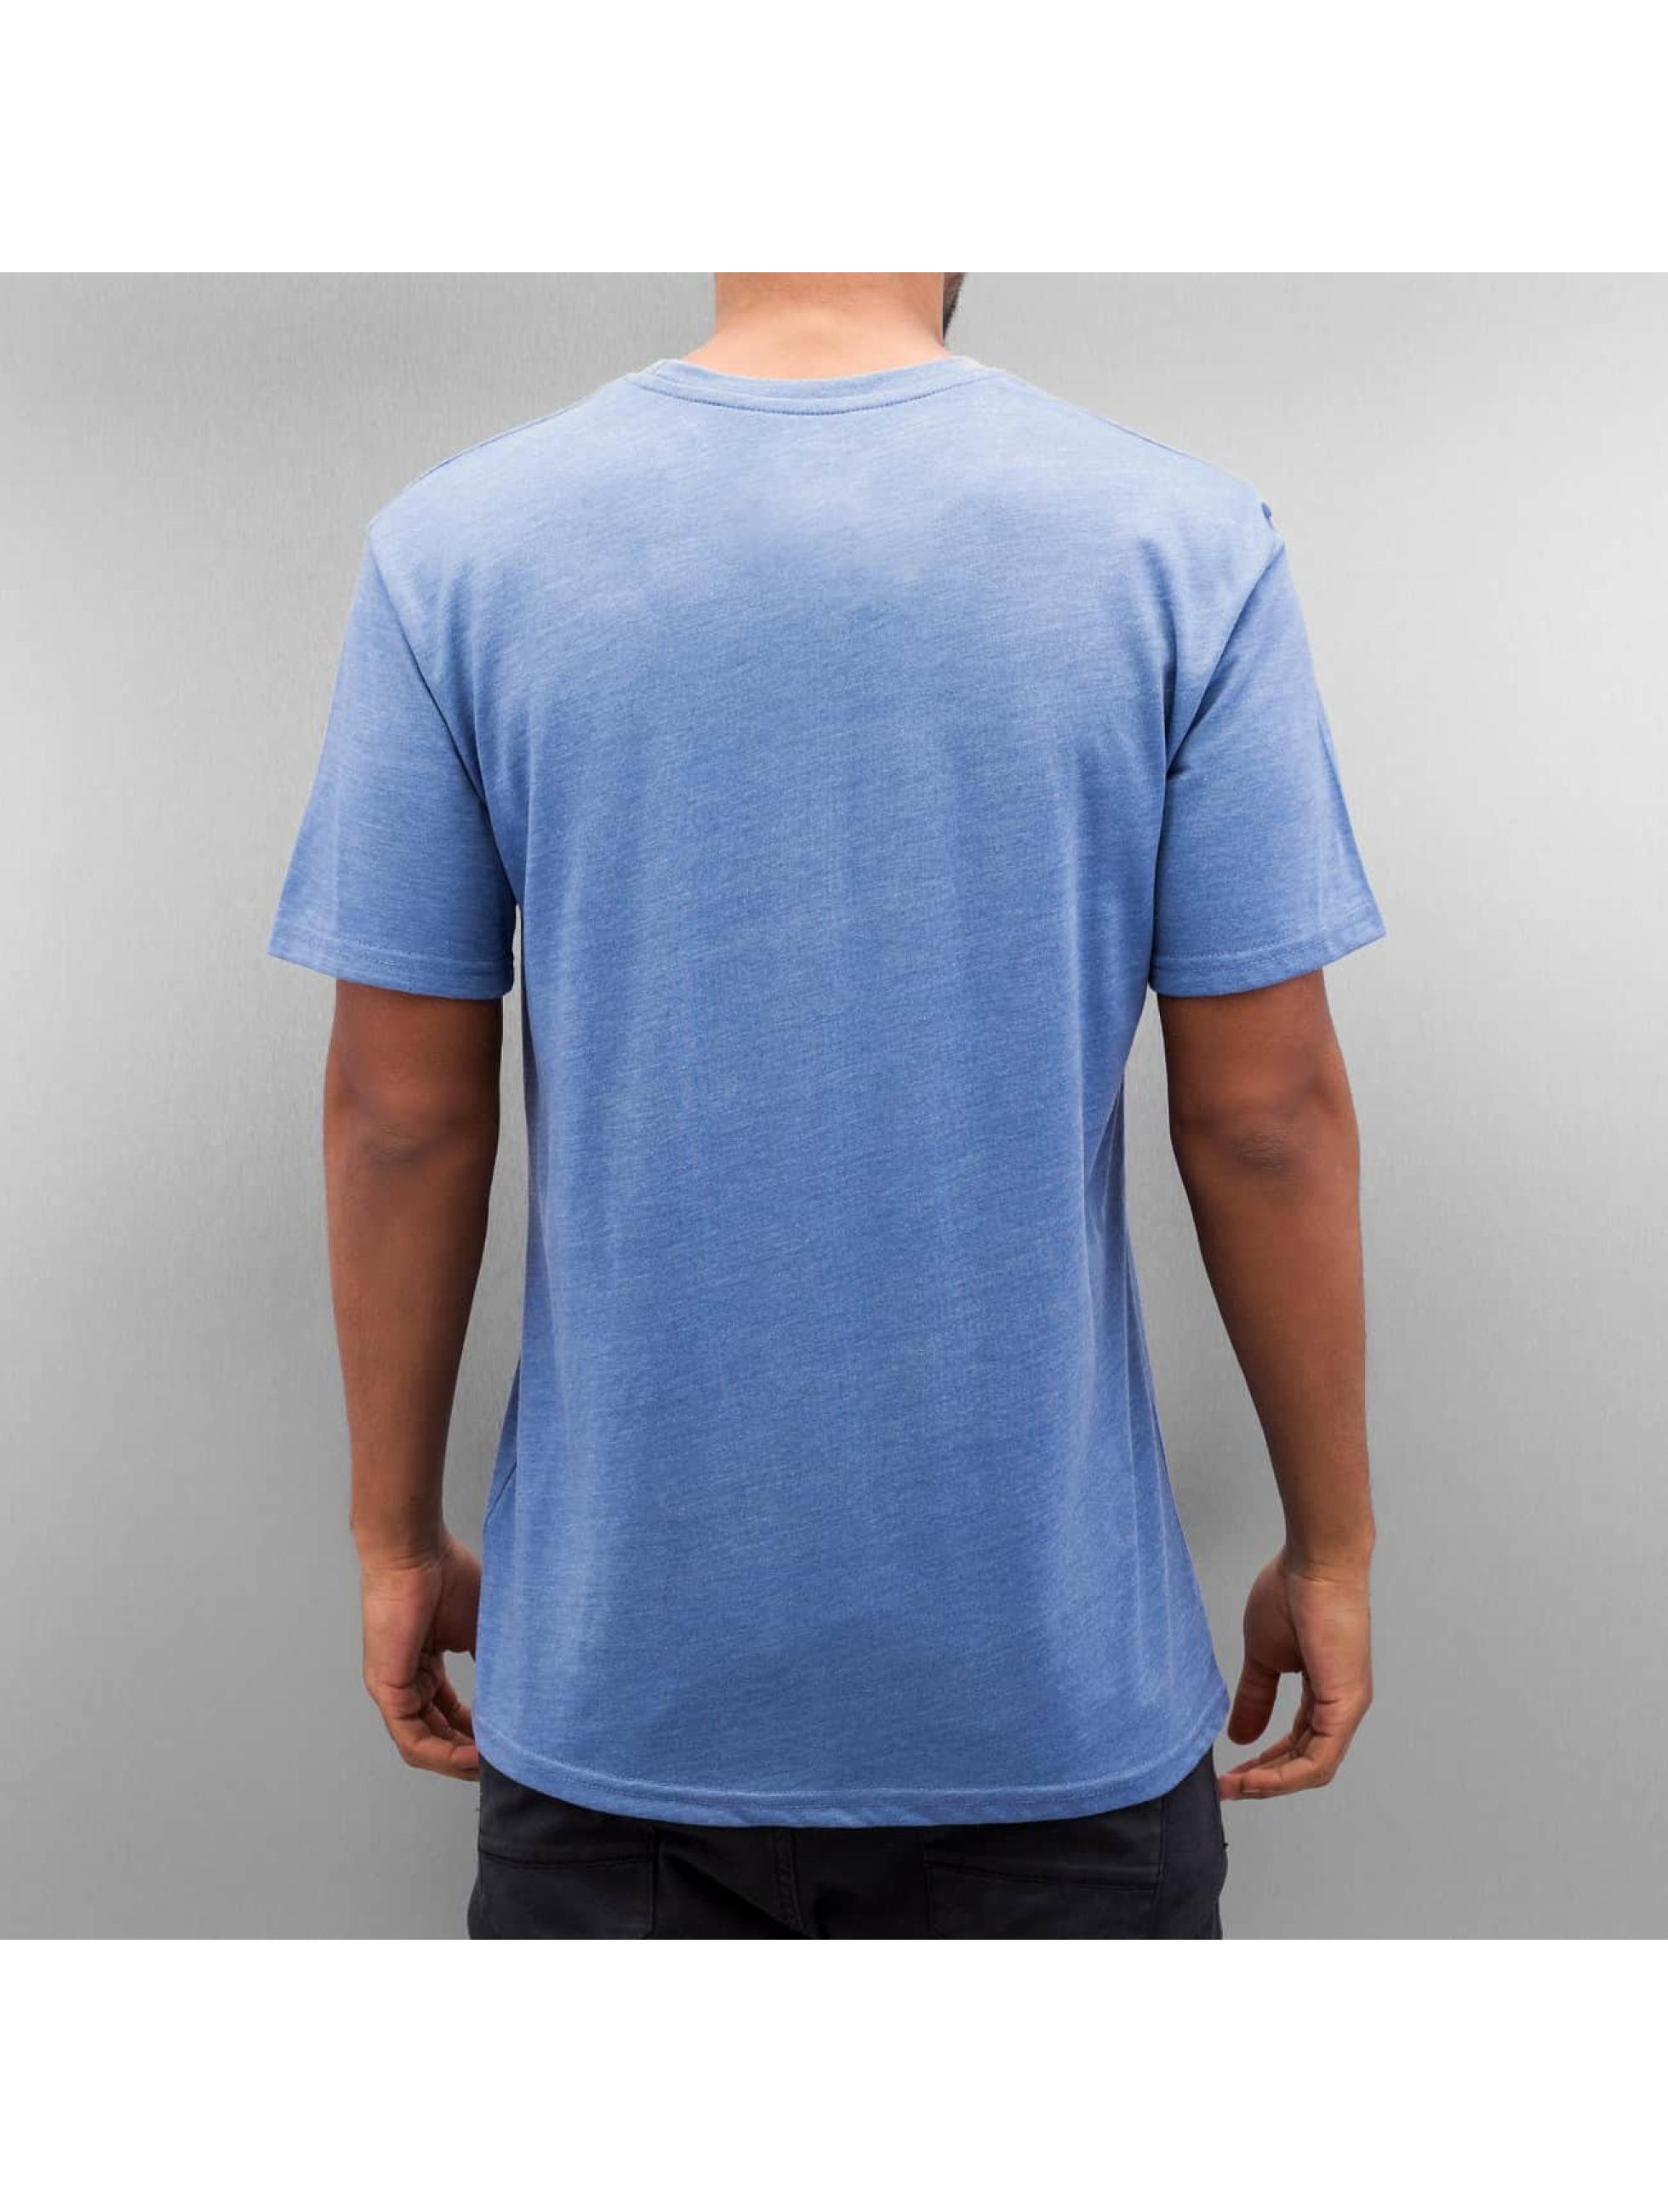 Cyprime Футболка Breast Pocket синий